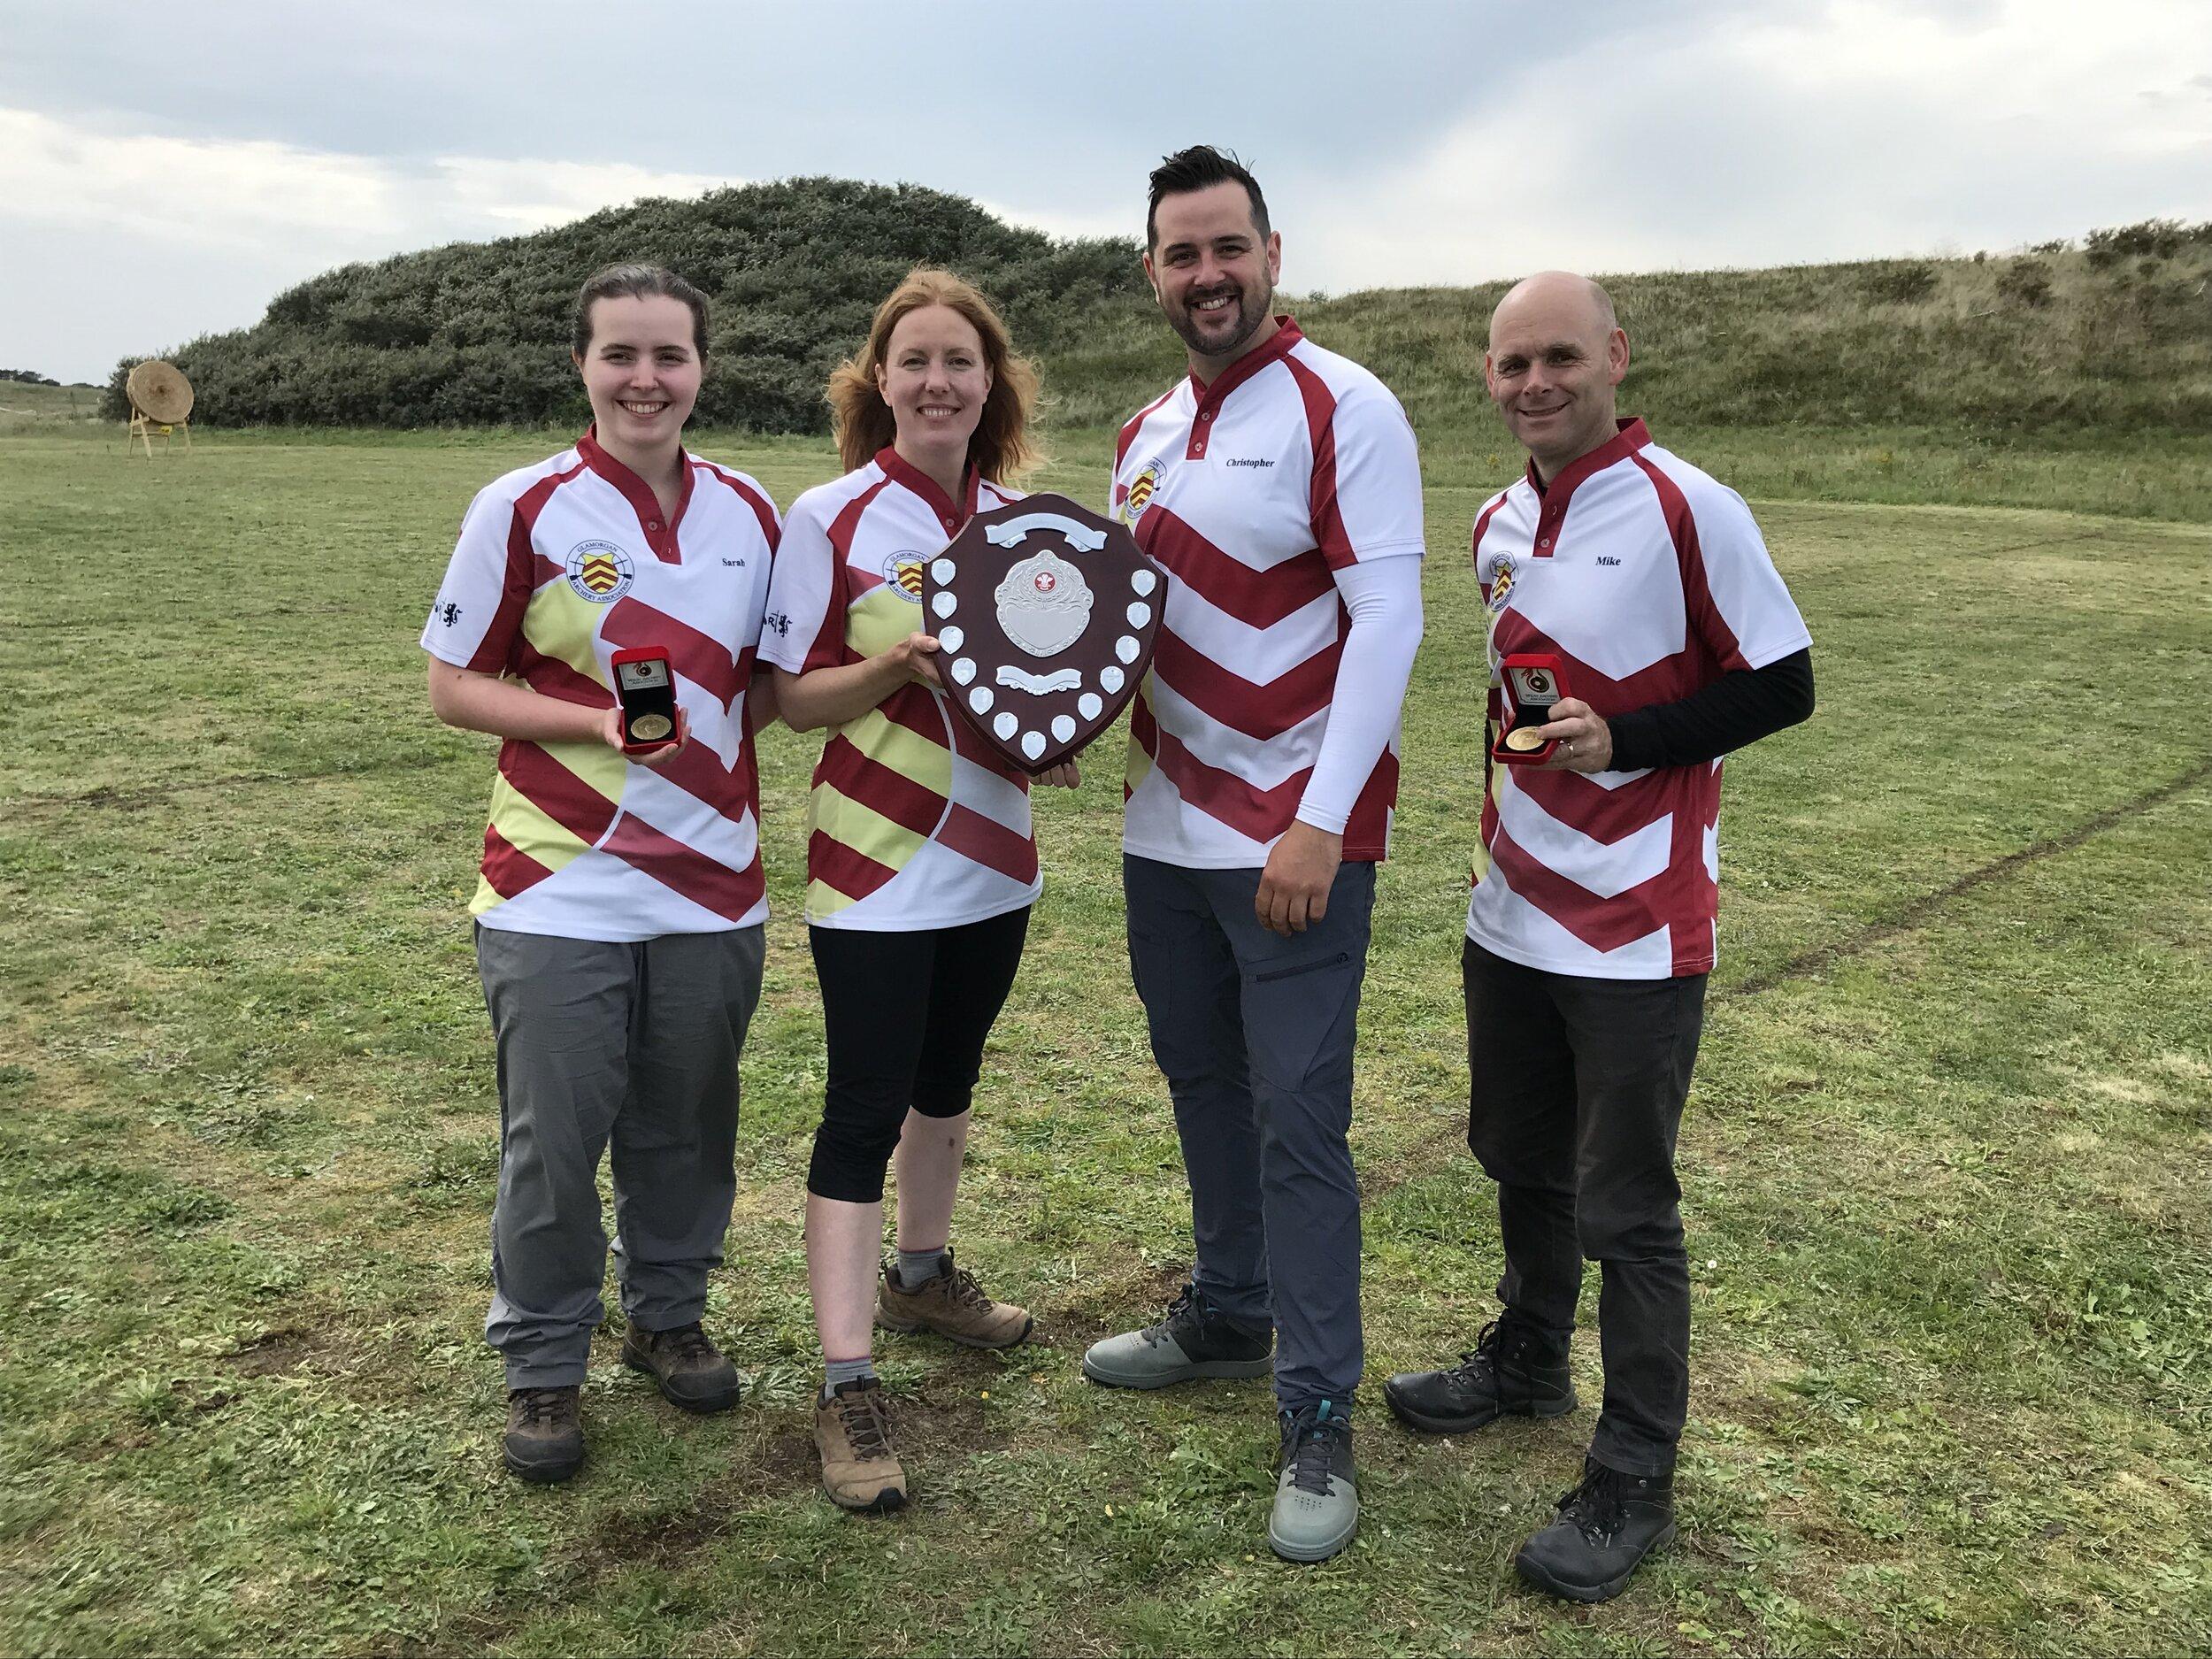 Castle Bowmen Barebow Champions